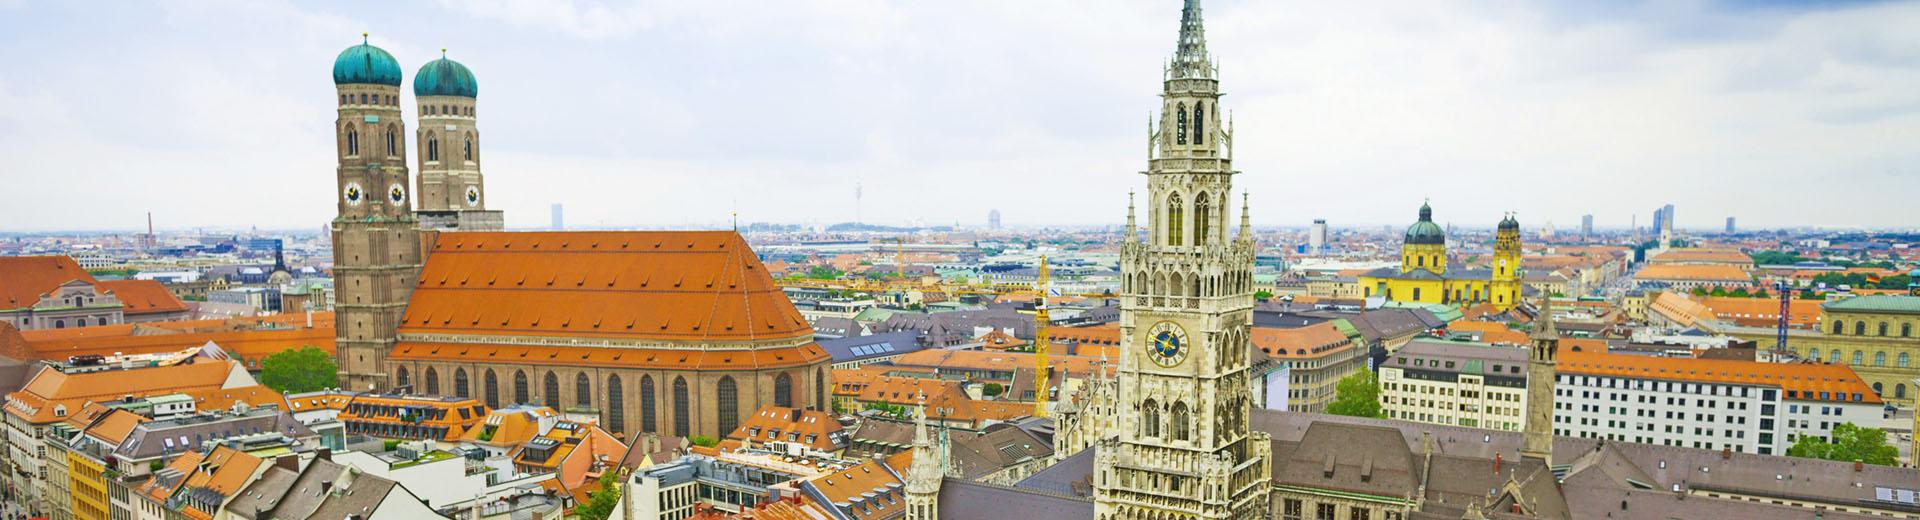 Gruppenreise München - Package Gruppen Select Bahn